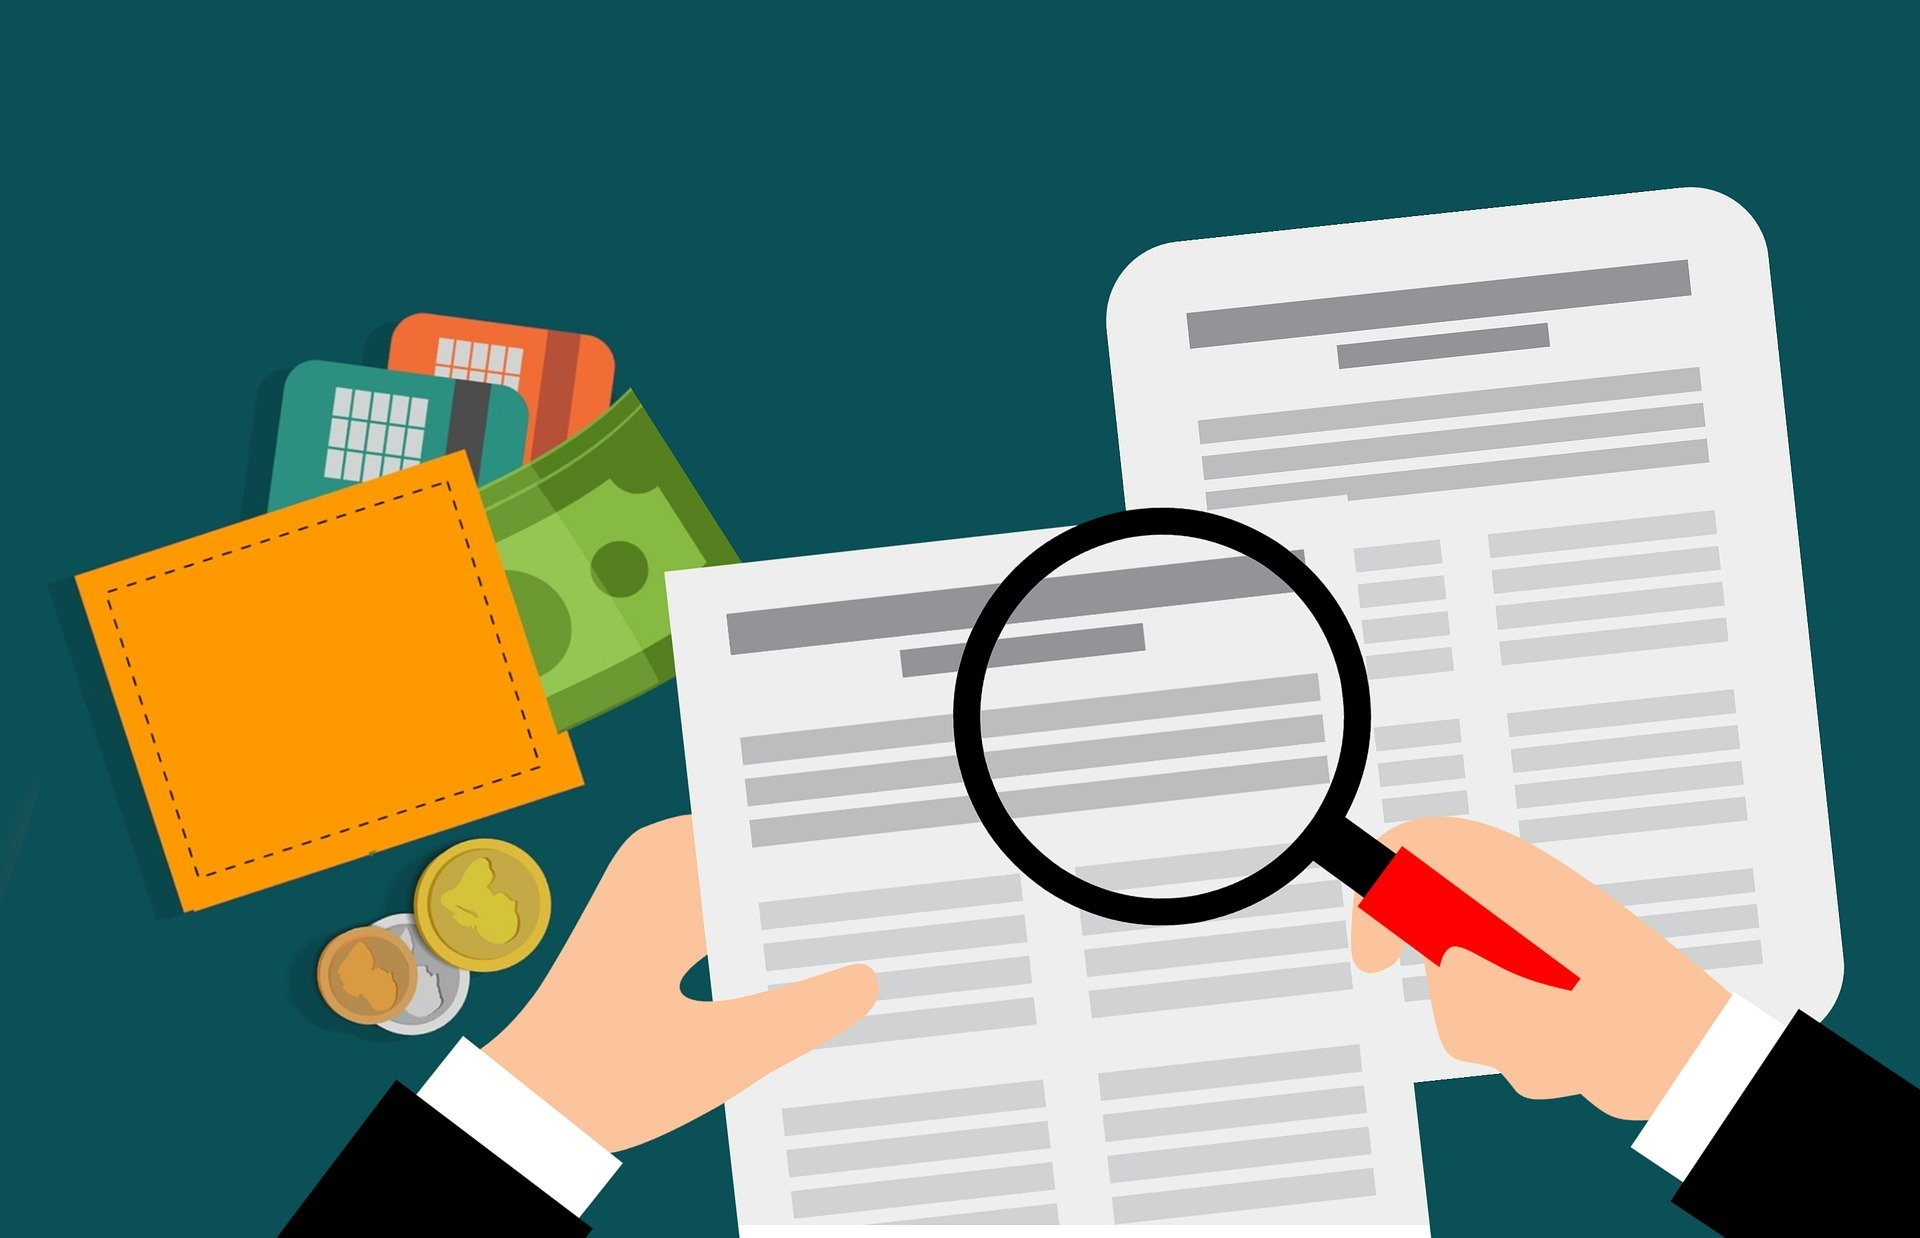 financial information in order